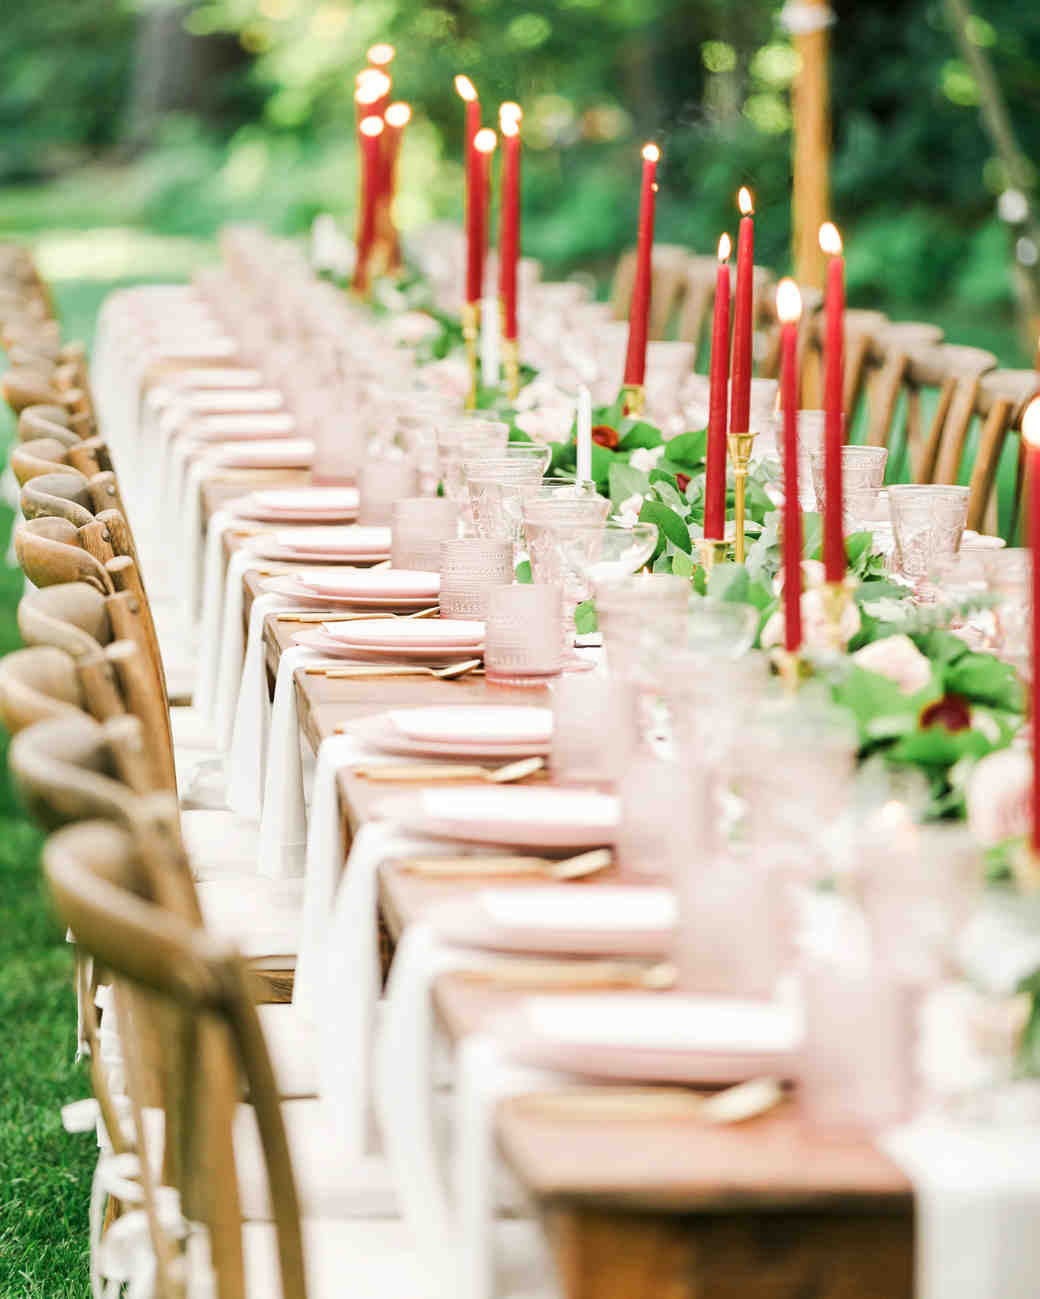 vanessa steven wedding placesetting tables